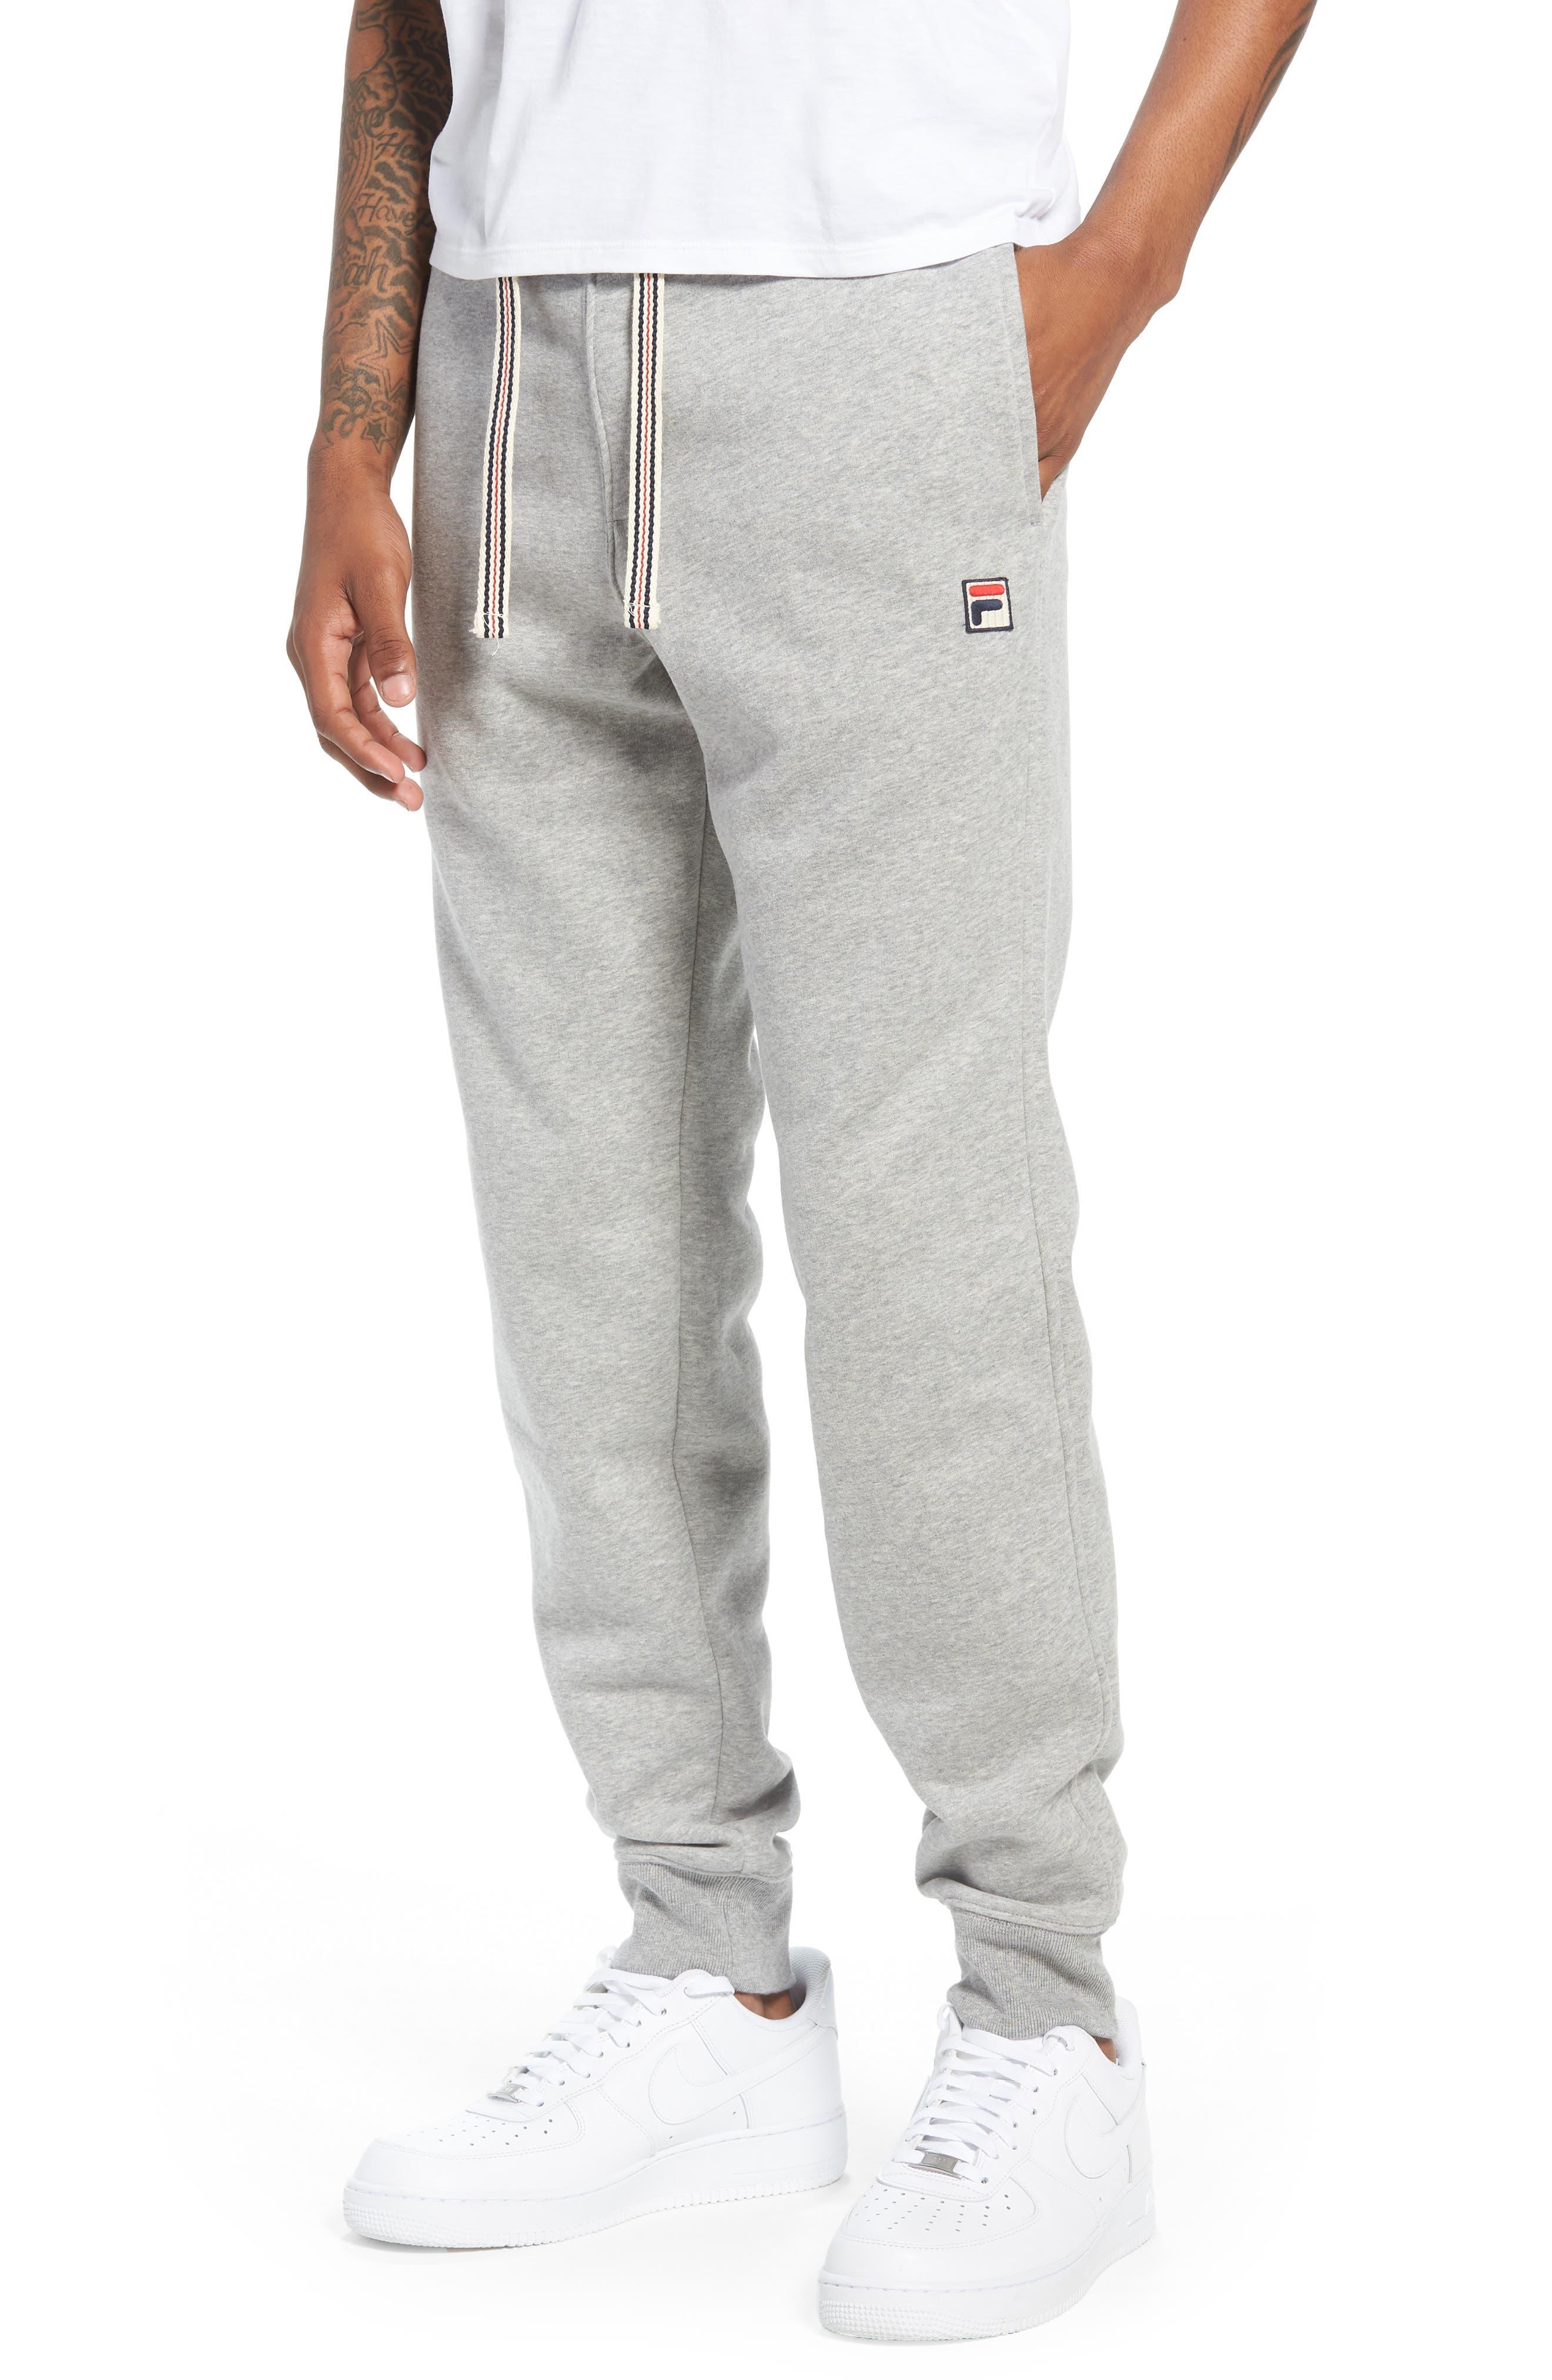 Jogger Pants,                         Main,                         color, 020